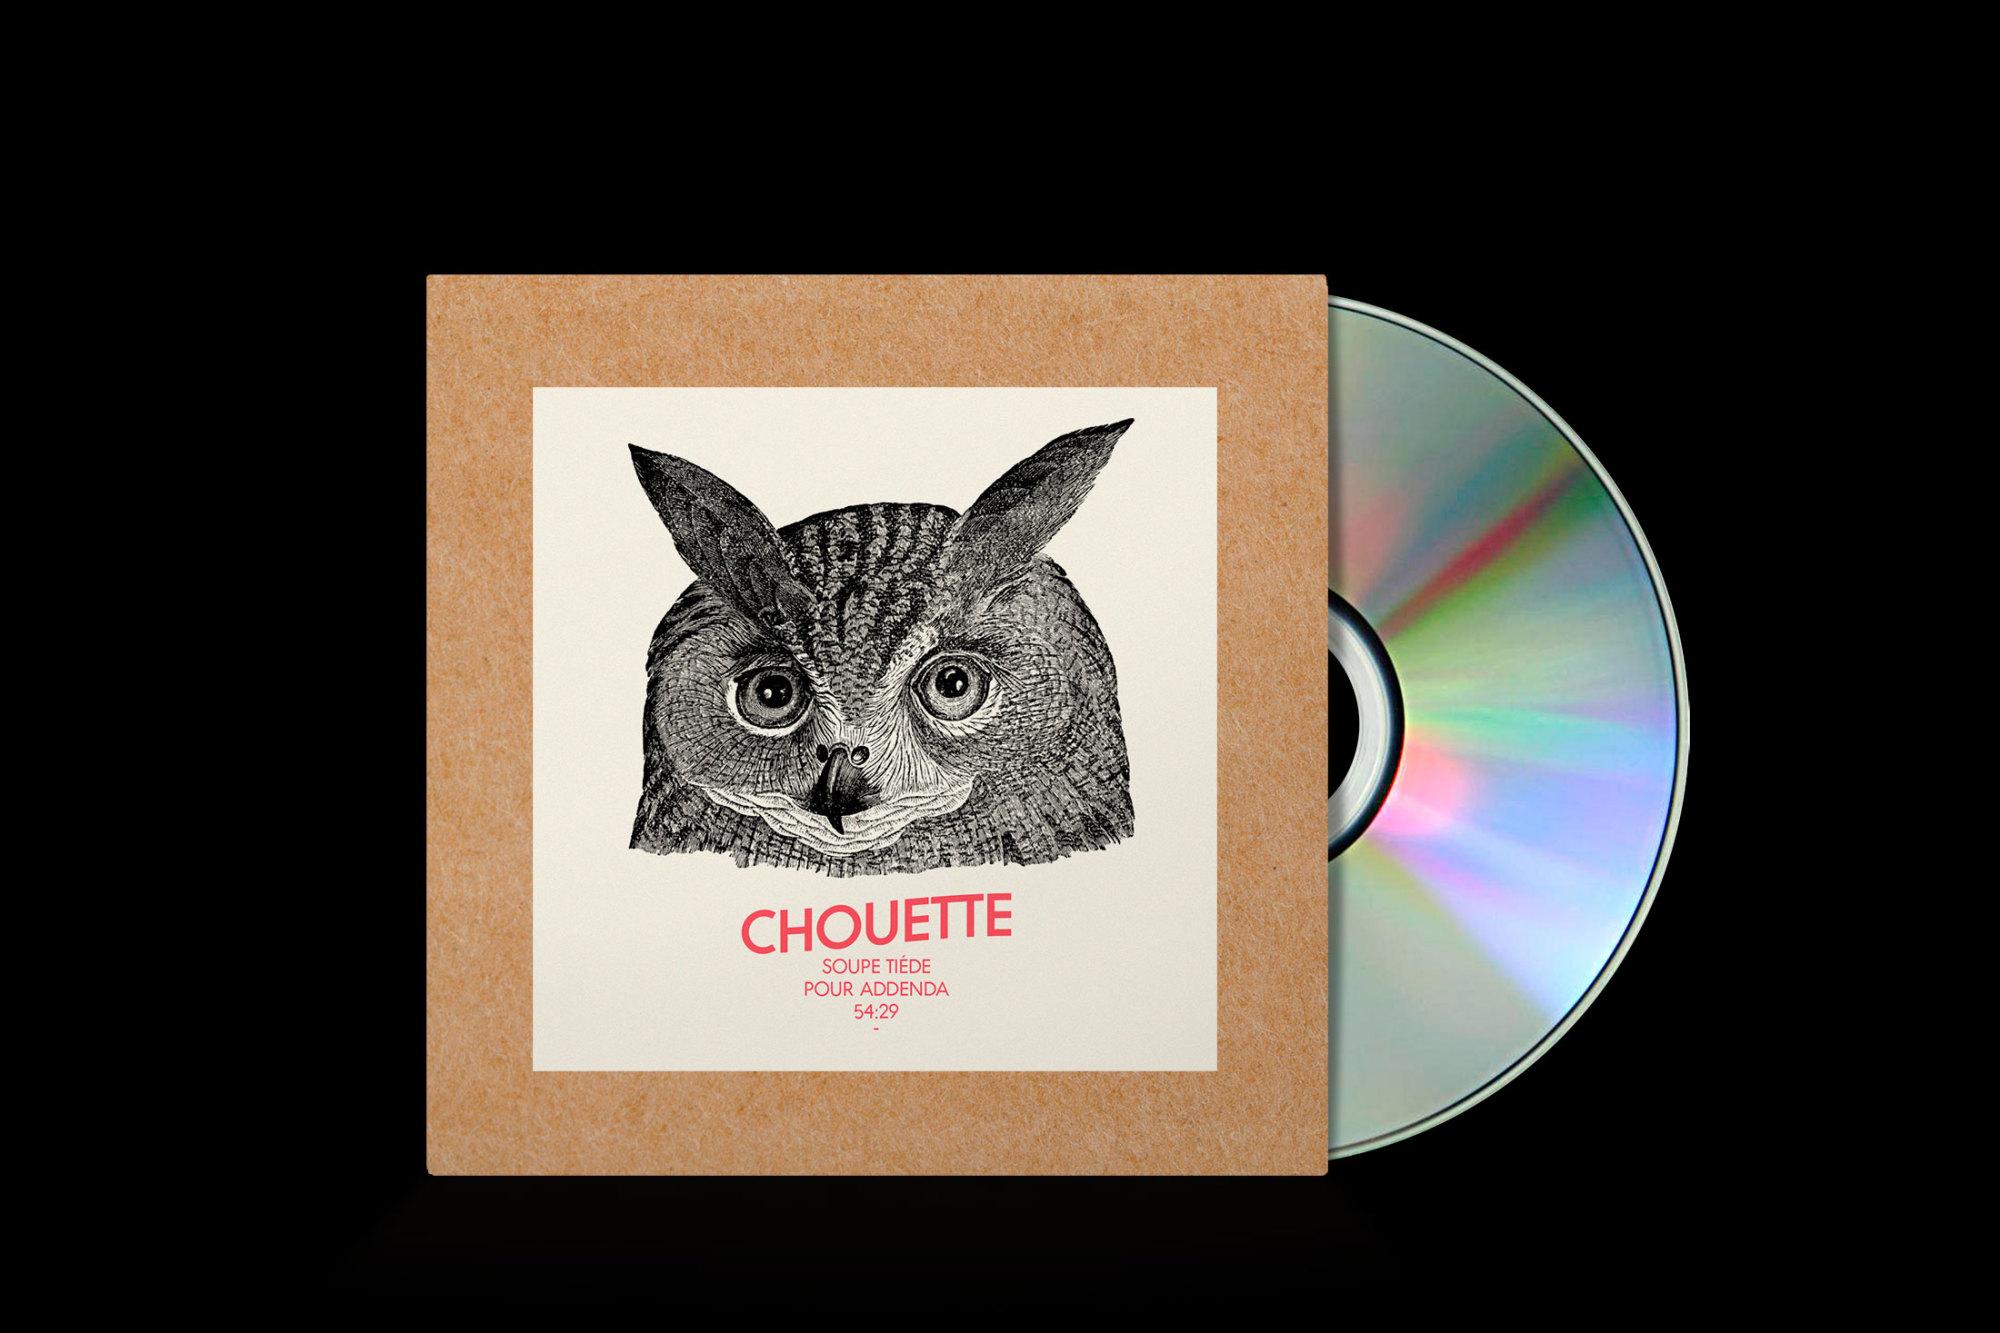 Graphisme Geneve graphic design graphique direction artistique cd music